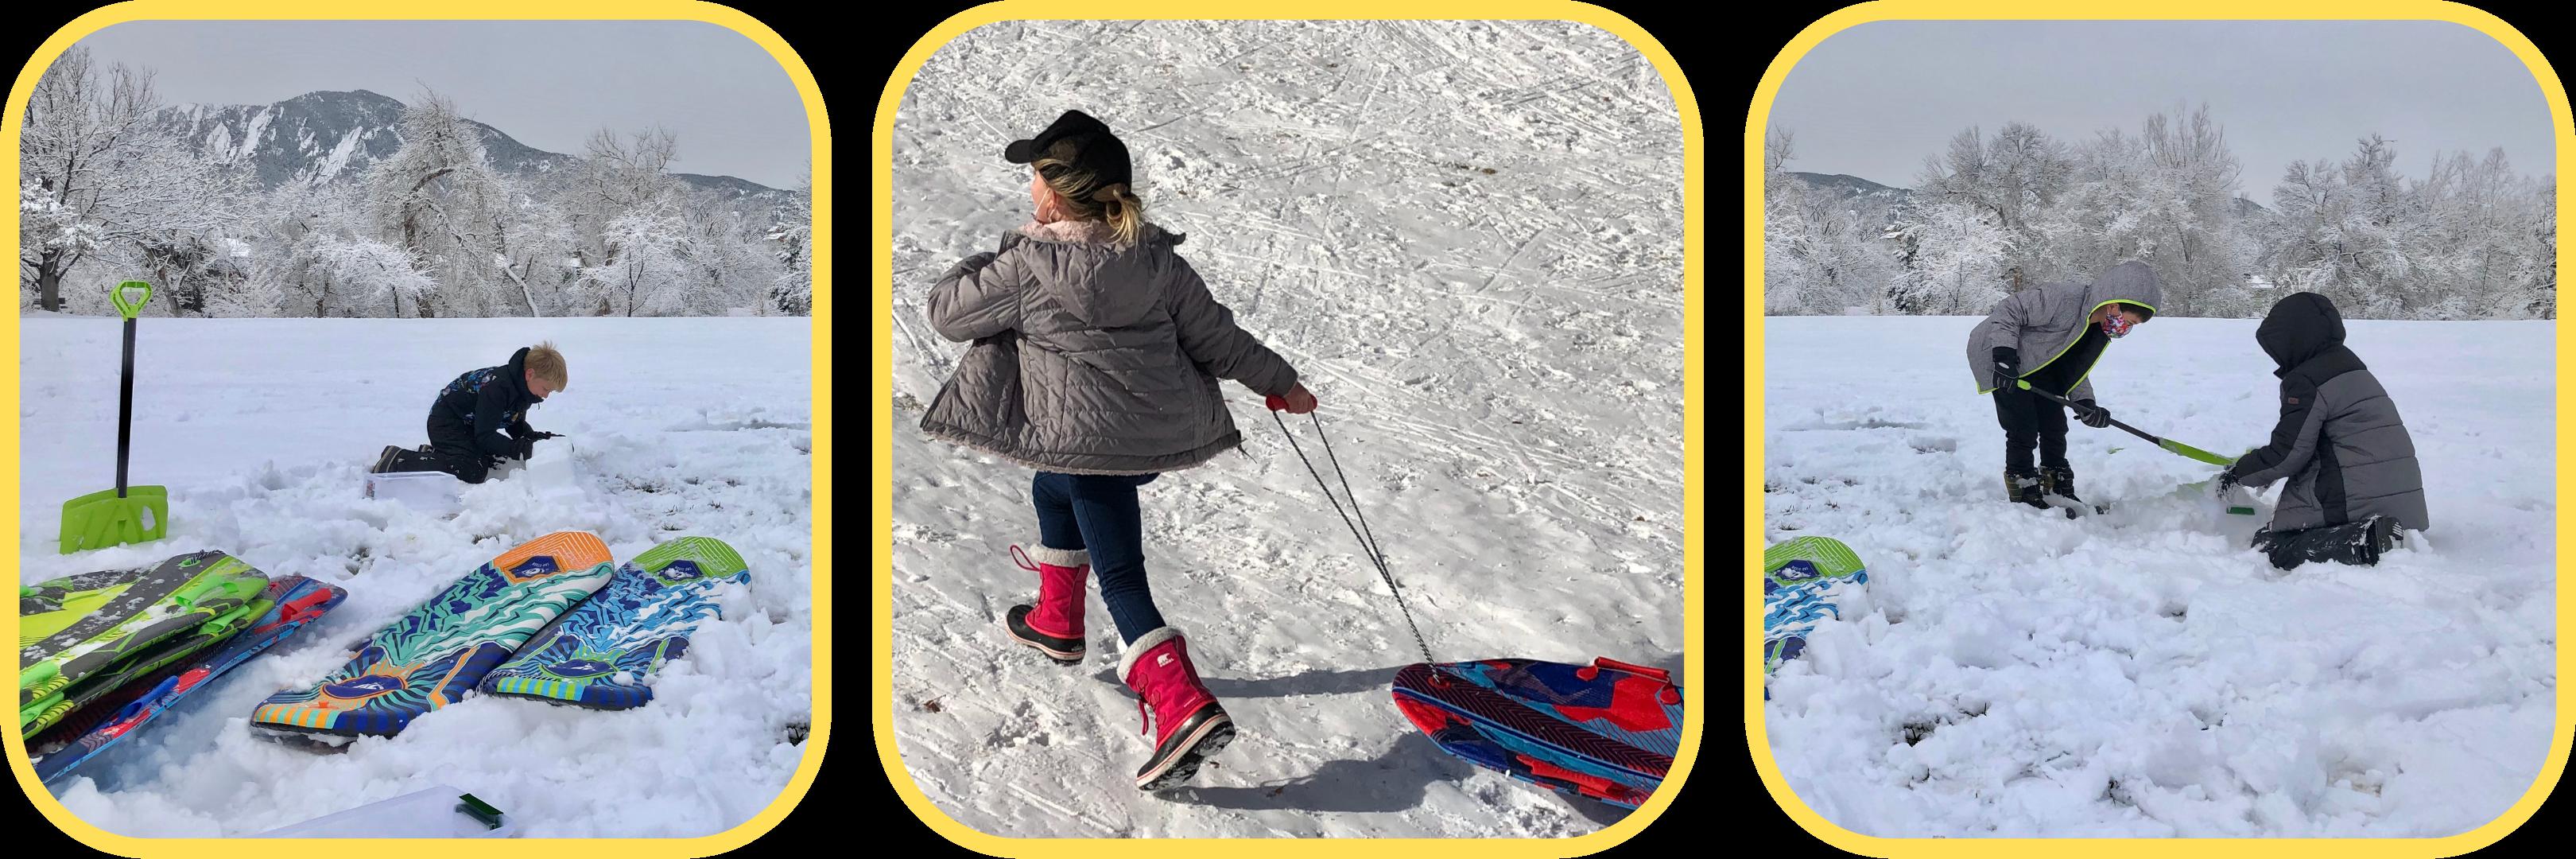 denver-tour-club-school-year-adventures-day-camp-kids-outdoor-adventures-2021-5-.png